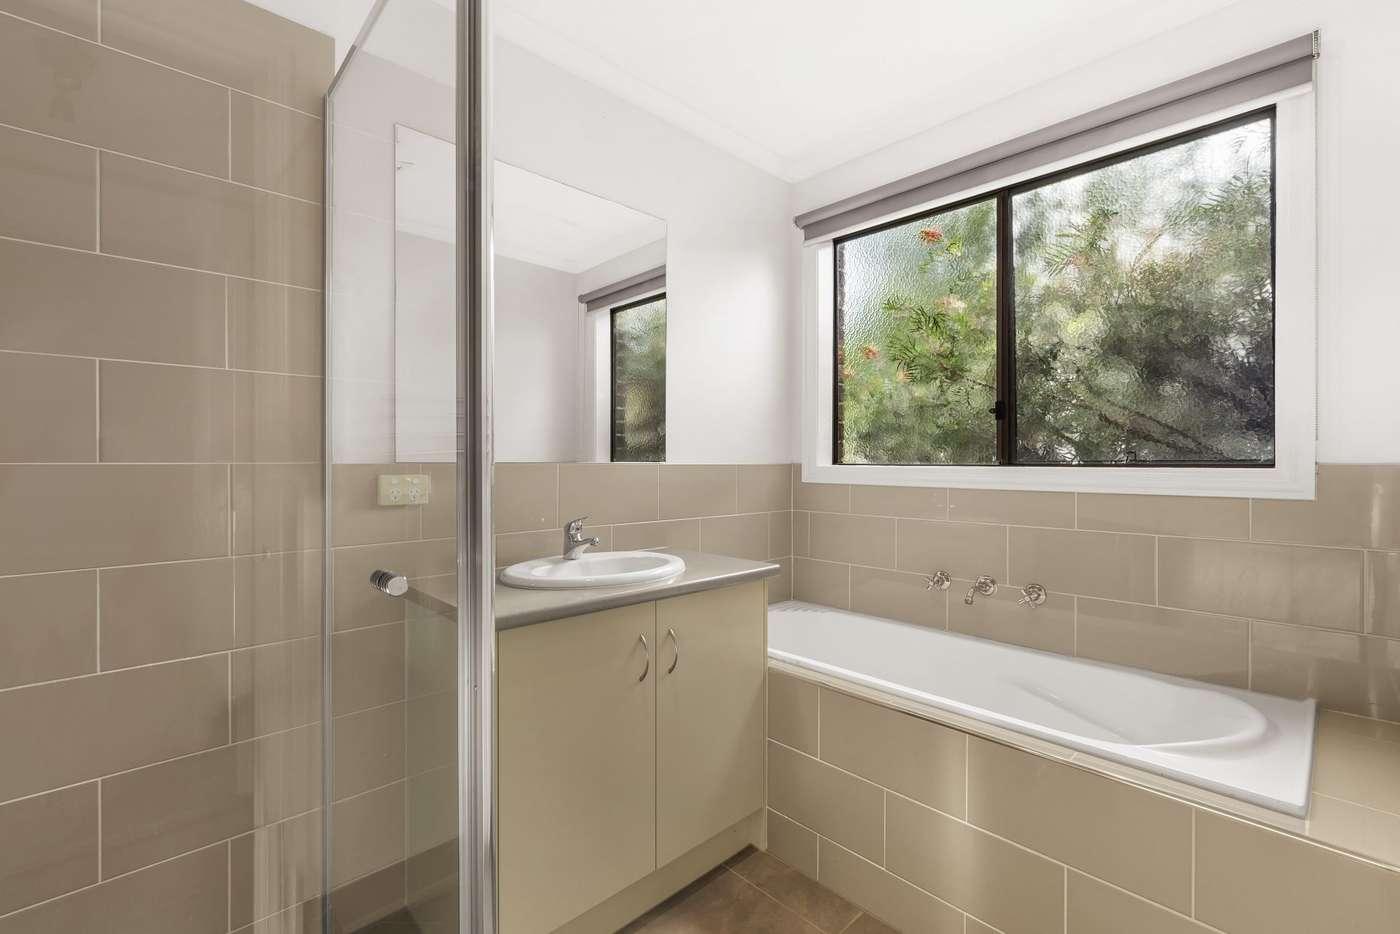 Sixth view of Homely house listing, 1 Swamp Gum Close, Pakenham VIC 3810